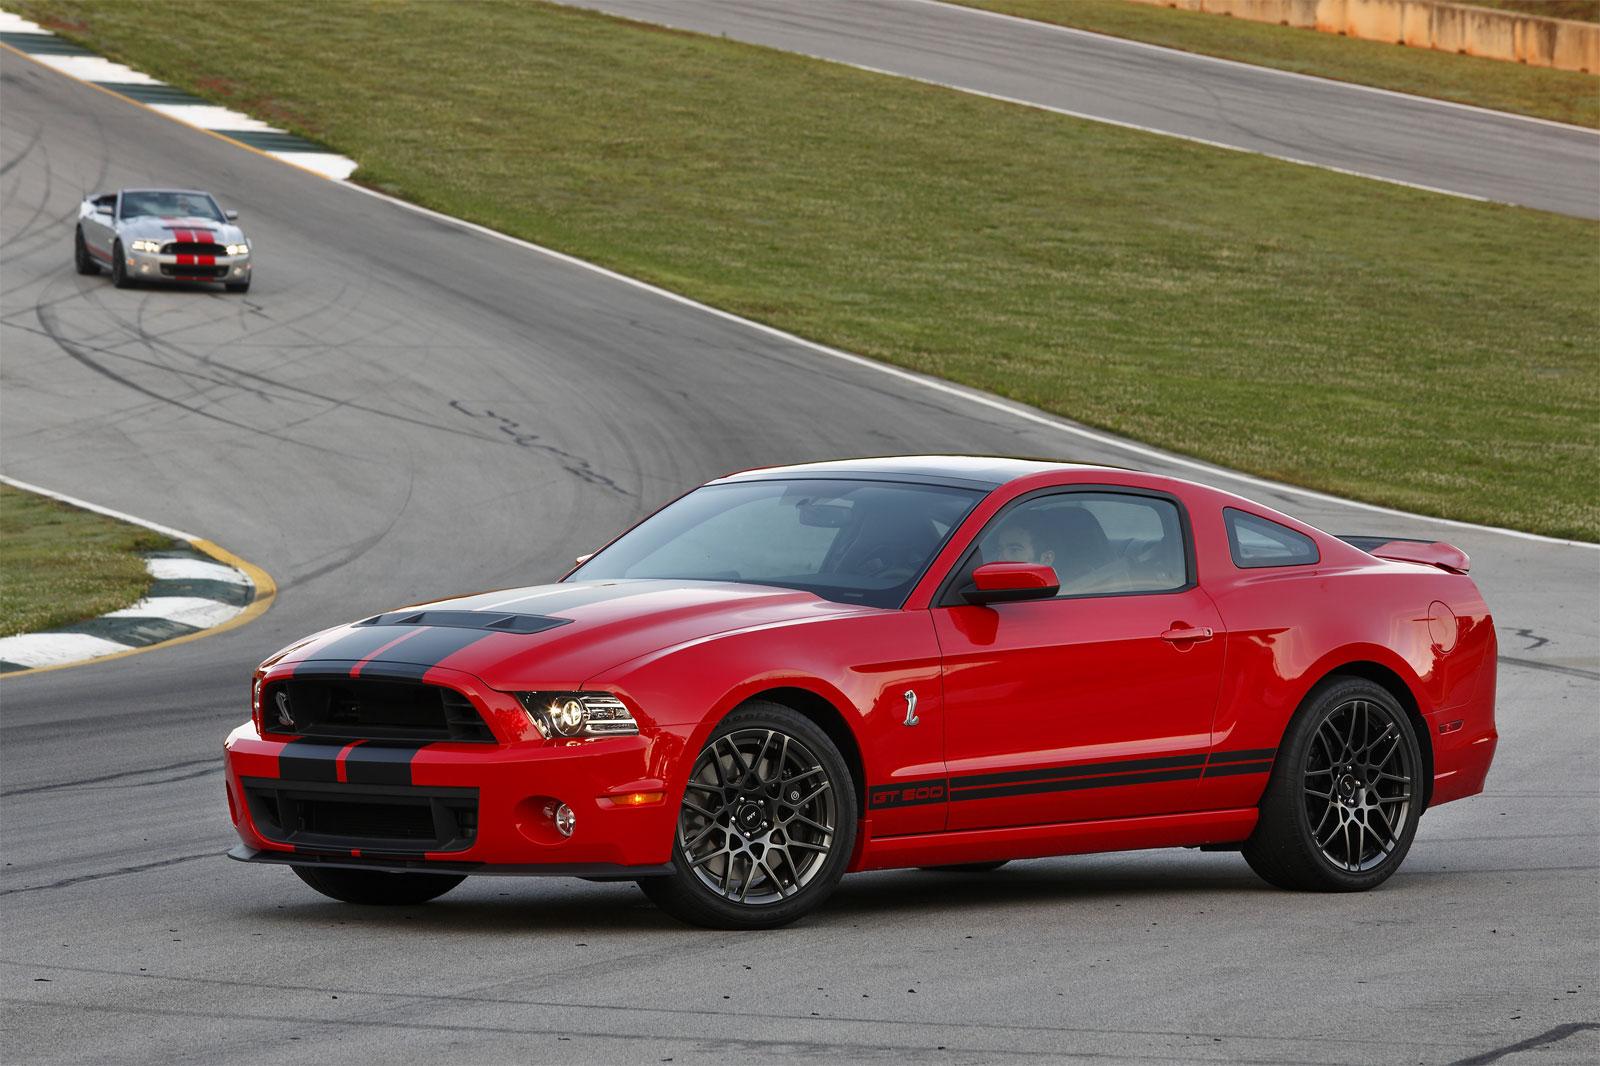 http://3.bp.blogspot.com/-yuJn8BDgo5k/T-N1QFLlCAI/AAAAAAAADzY/ioQH4X_C86Y/s1600/Ford+Shelby+GT500+Hd+Wallpapers+2013_2.jpg